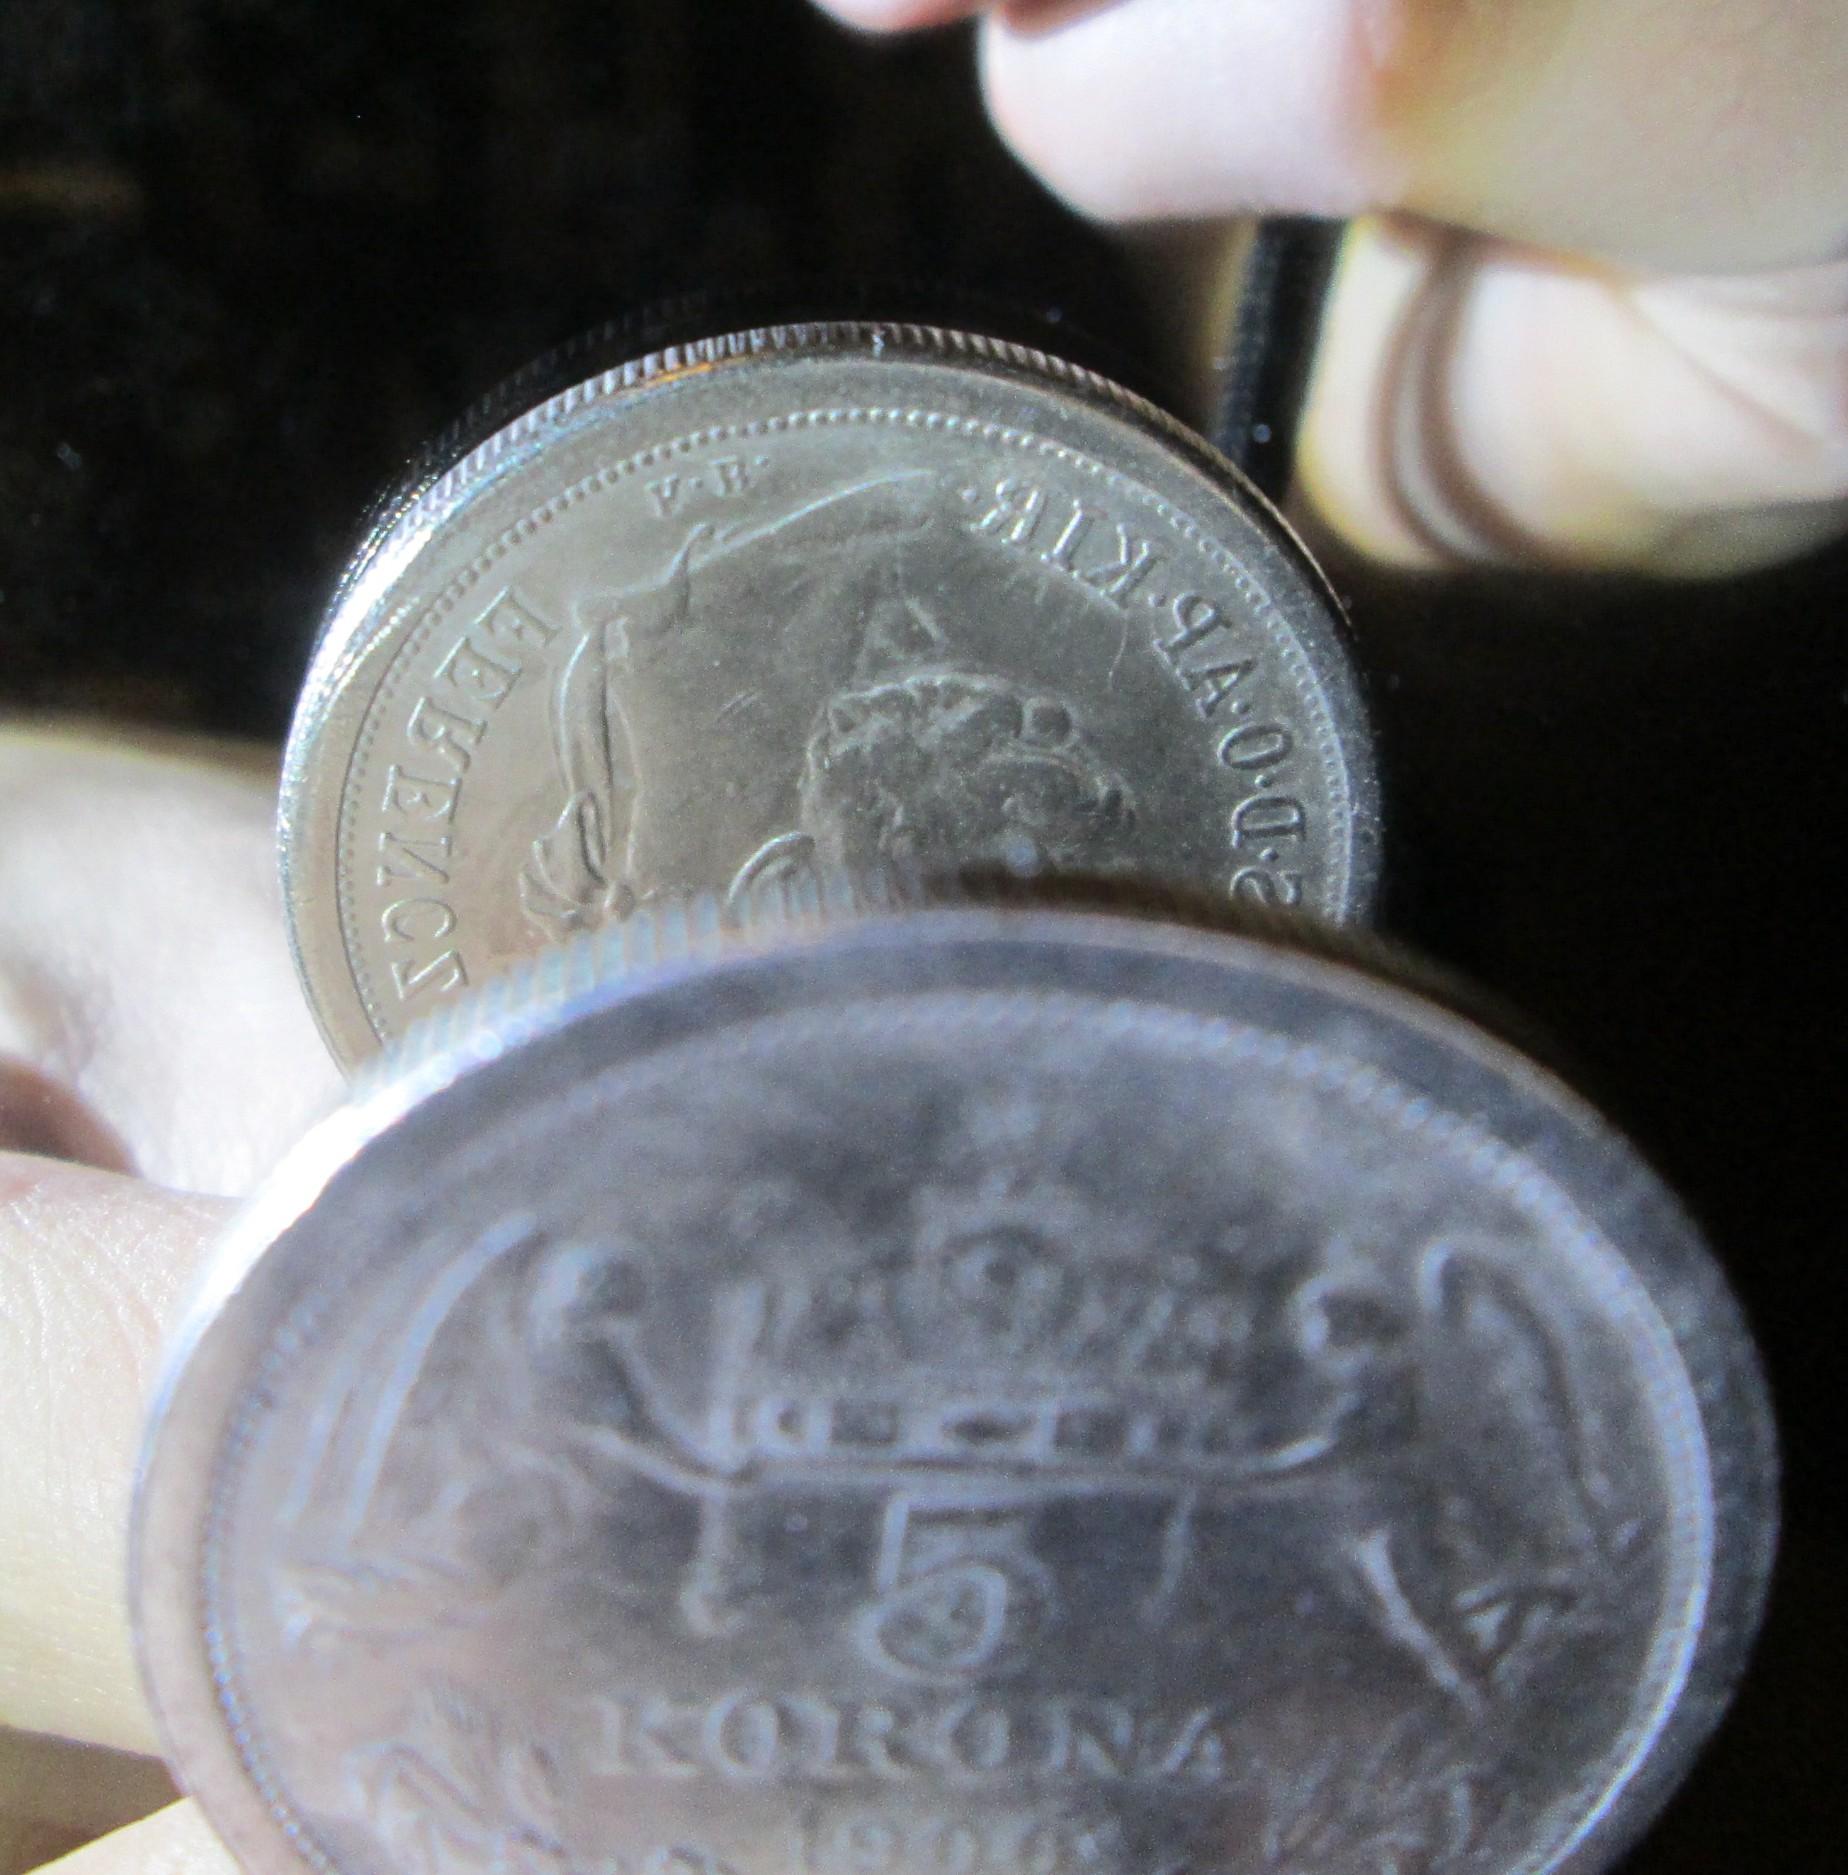 http://www.koronaportal.hu/hirek/1900-as-5-korona-reces-peremu-vas-masolata-kinabol-copy-replika-hamis/1900-as-5-korona-reces-peremu-vas-masolata-kinabol-copy-replika-hamis_180-fokban-elfordult.jpg